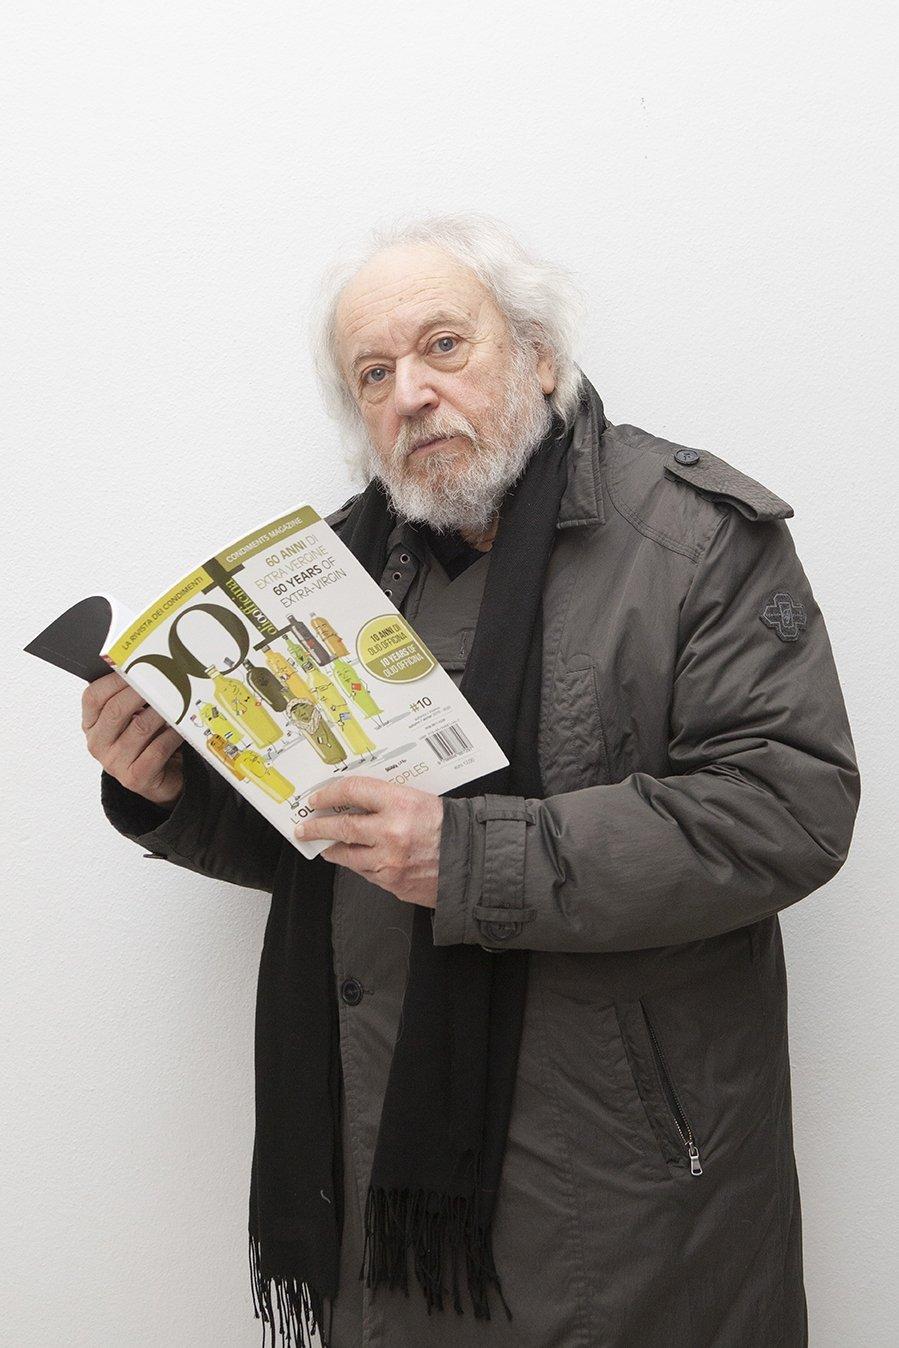 Il poeta Guido Oldani legge OOF